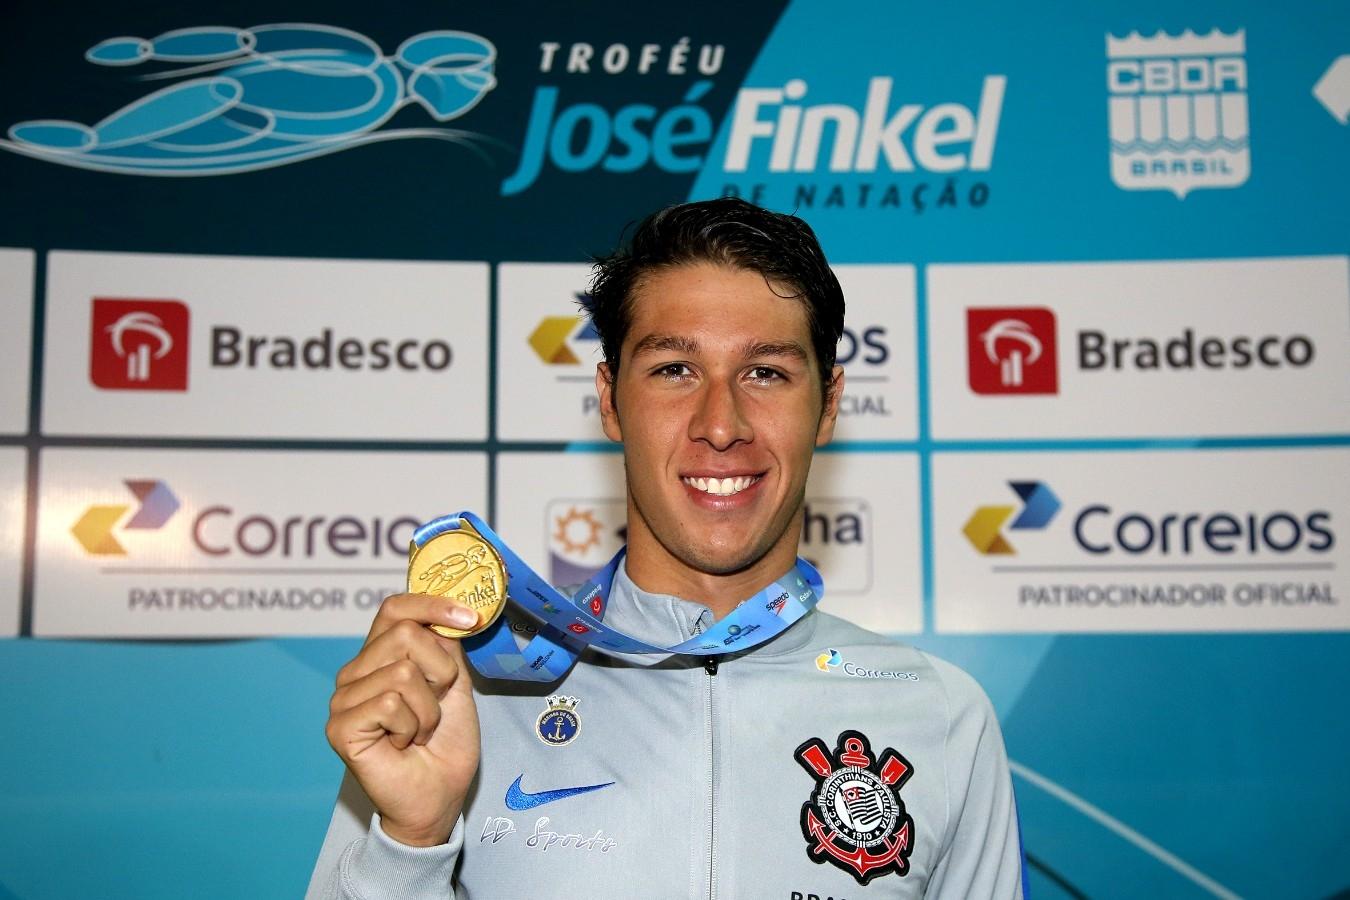 Brandonn Almeida - Trofeu Jose Finkel de Natacao no Clube Internacional de Regatas. 14 de Setembro de 2016, Santos, SP, Brasil. Foto:Satiro Sodré/SSPress.